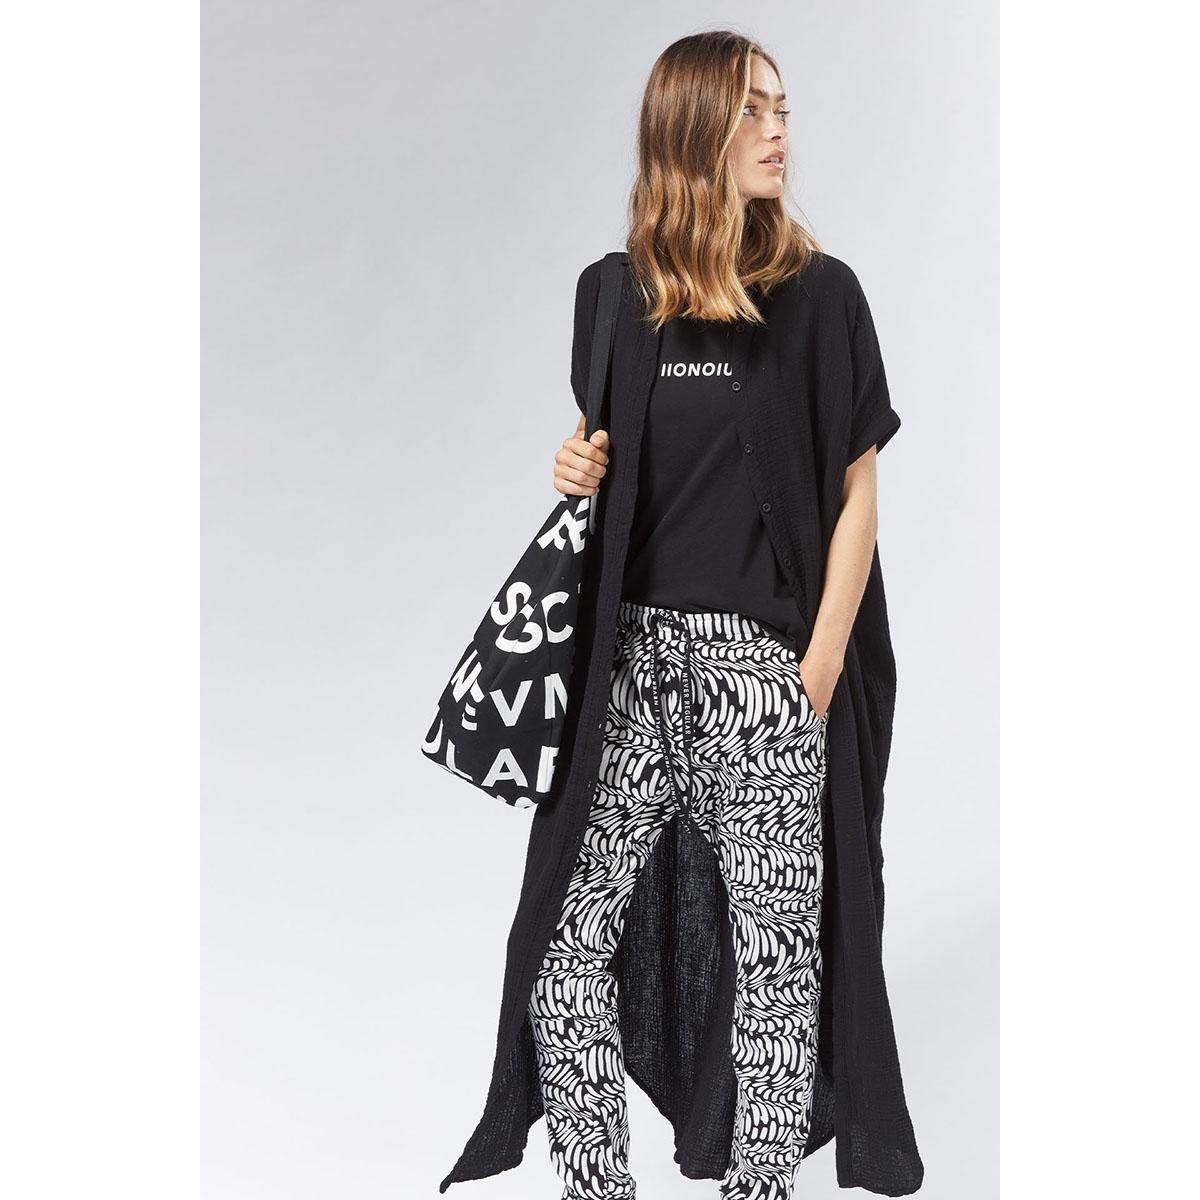 tee short sleeve 20 751 0201 10 days t-shirt black